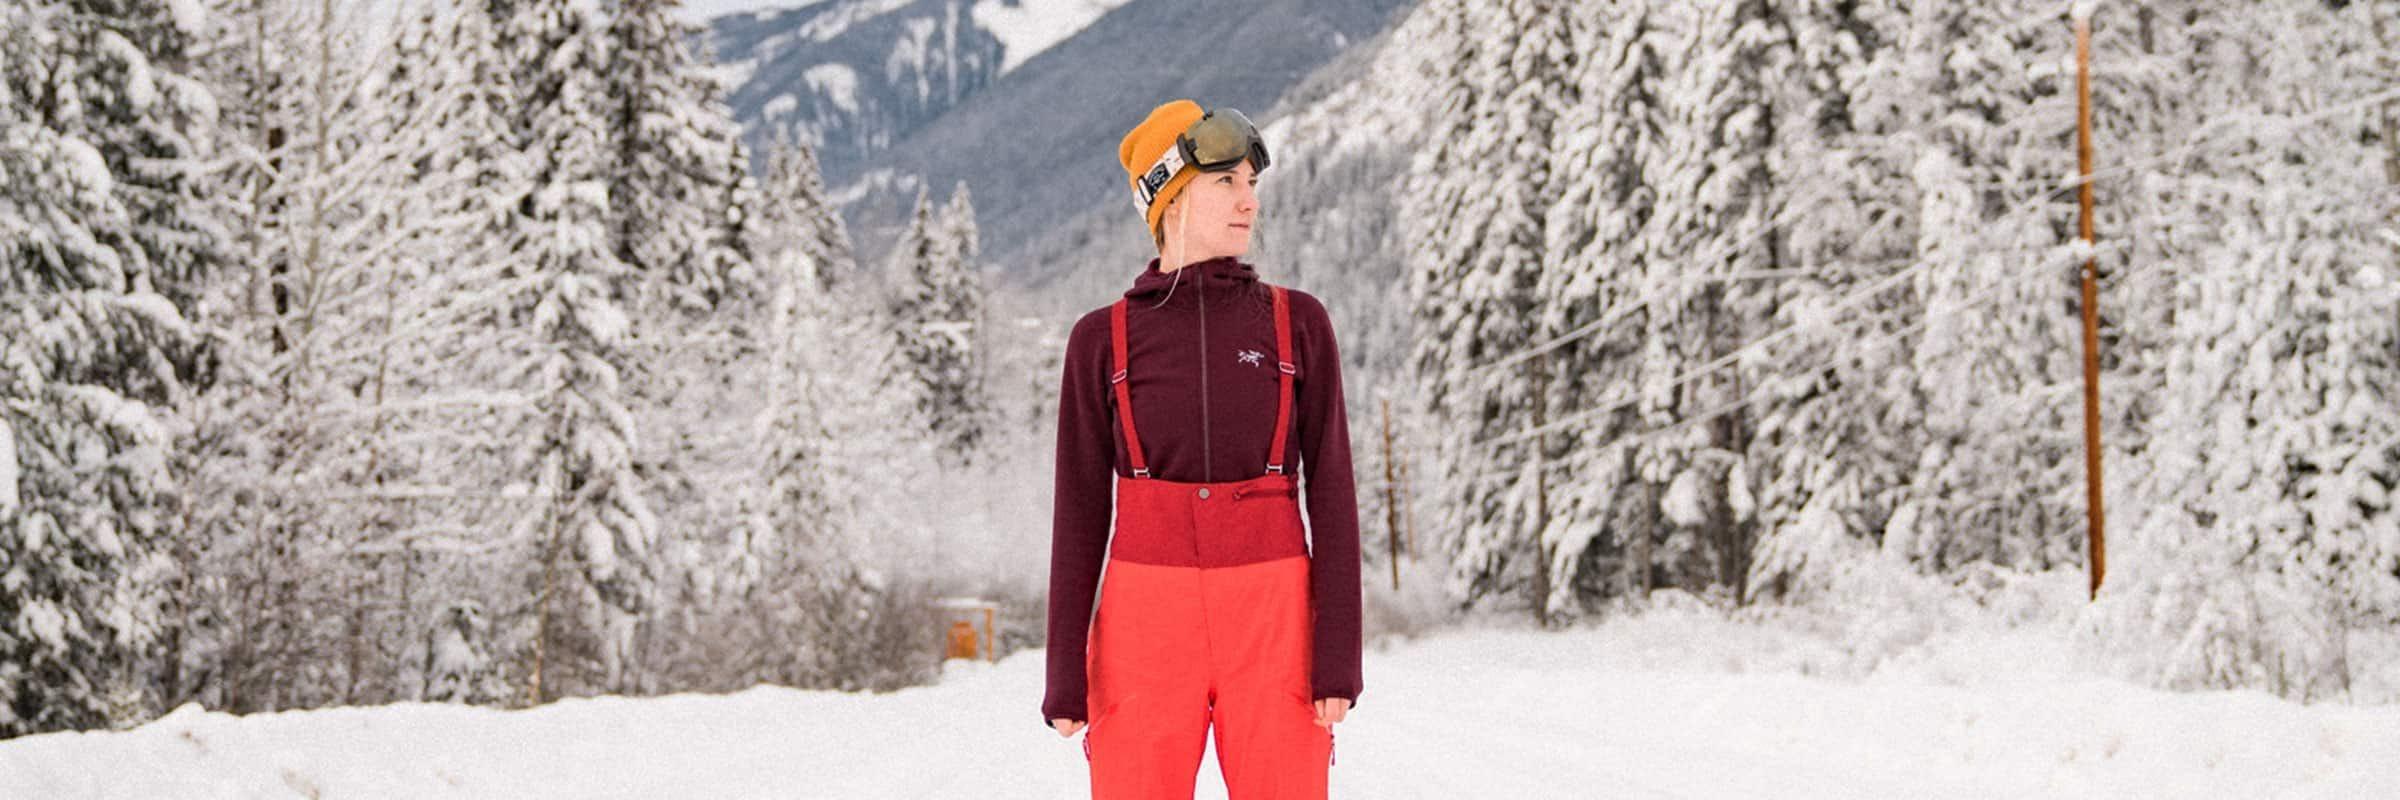 Arc'teryx, Ski & Snowboard. Arc'teryx Women's Shashka Pant Reviewed